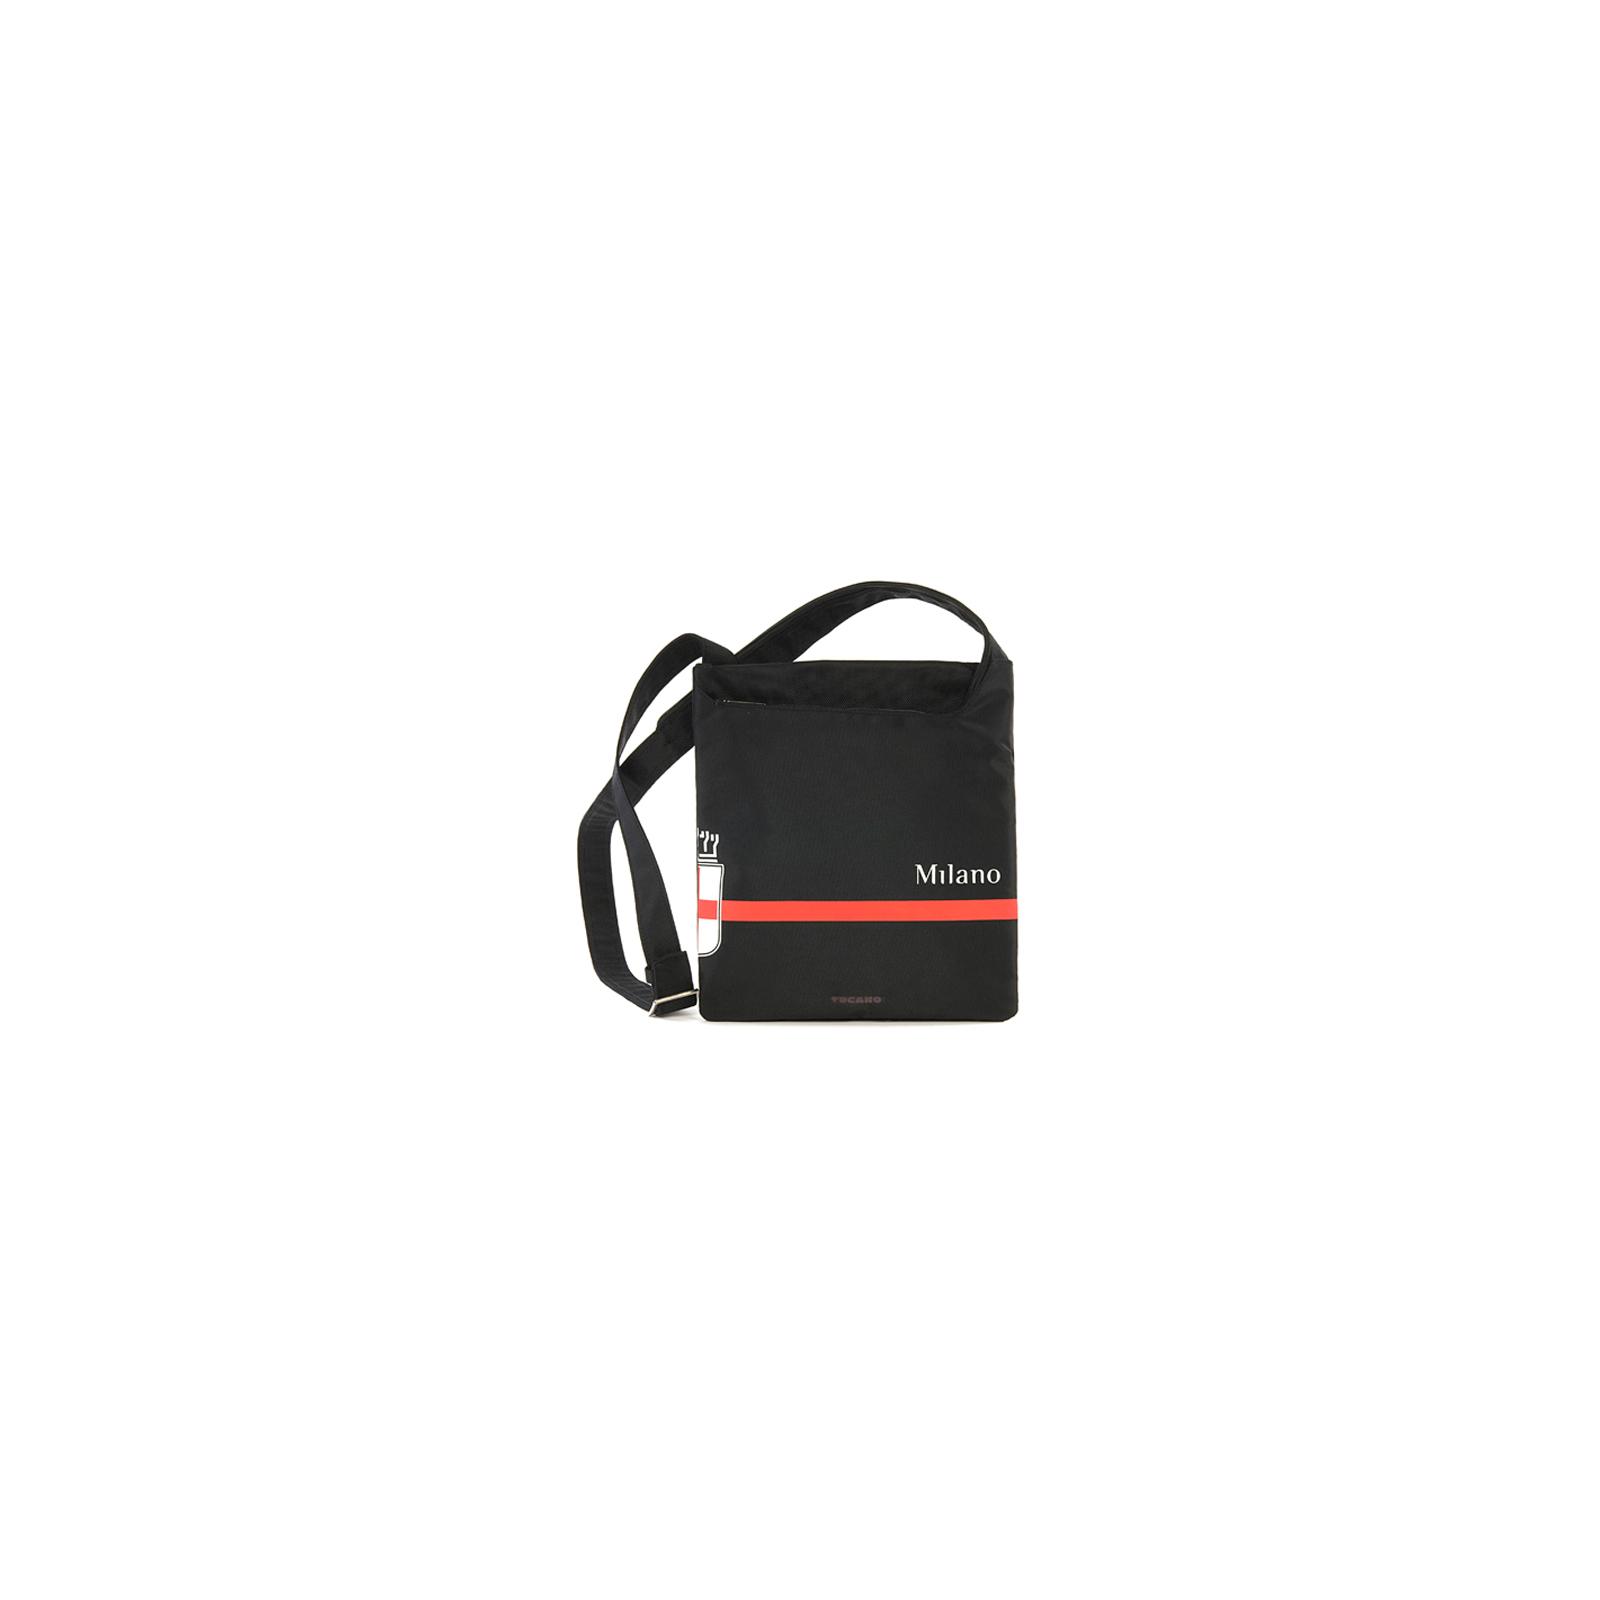 Чехол для планшета Tucano iPod Finatex City Milano /Black (MIBFITCI-G)